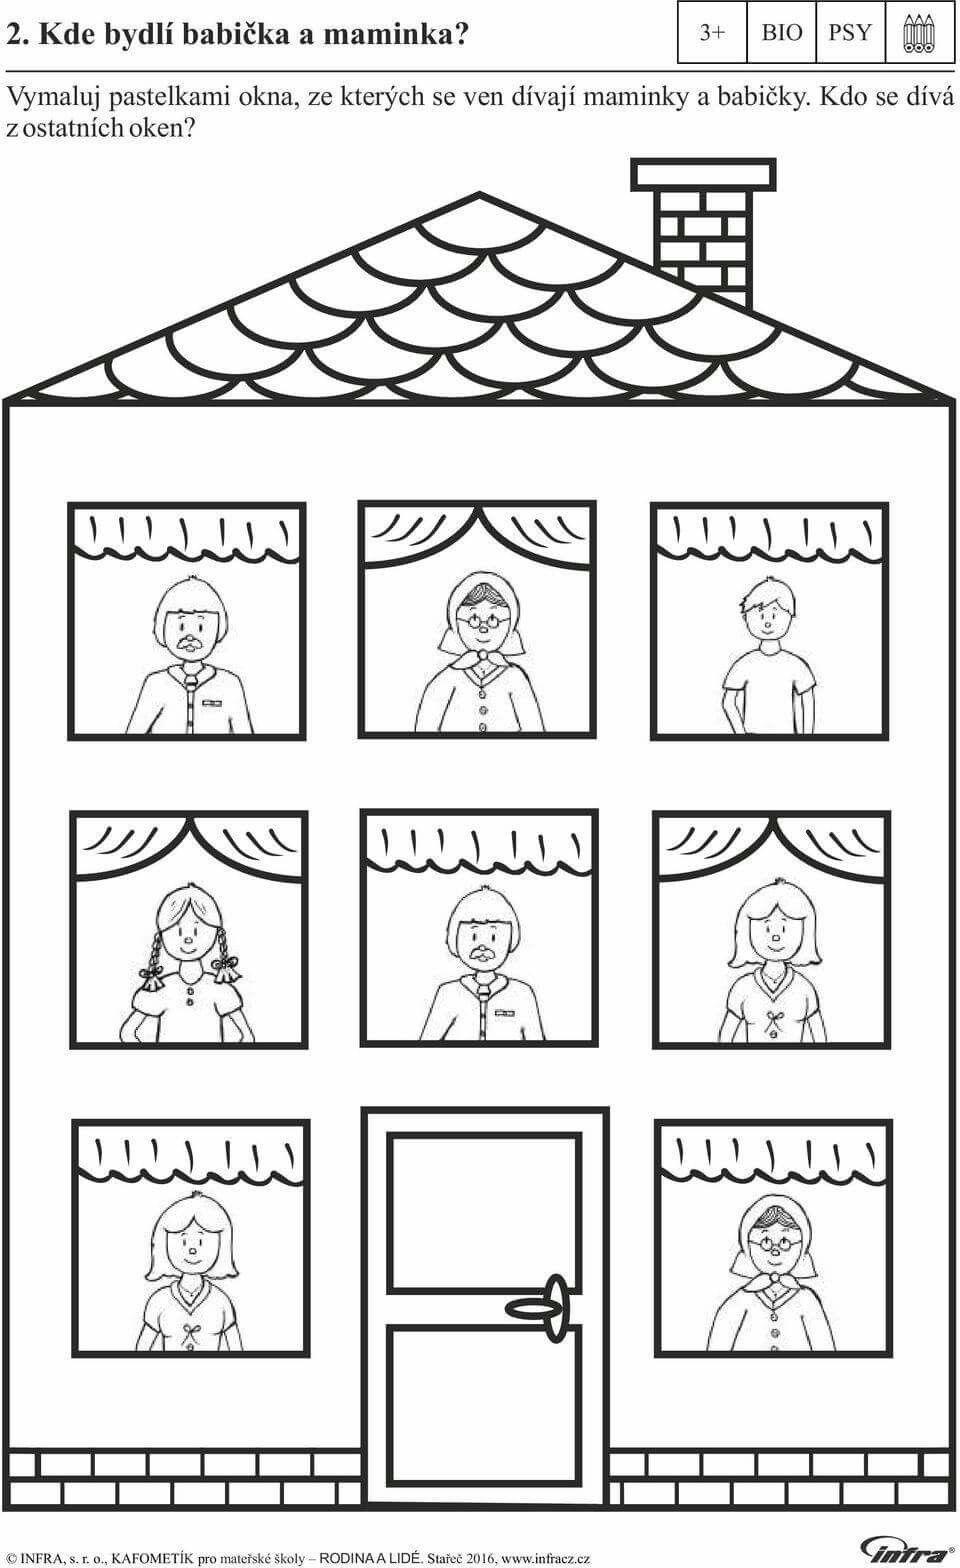 Pin By Leon On Kolorowanki Preschool Family Theme Family Theme Craft Work For Kids